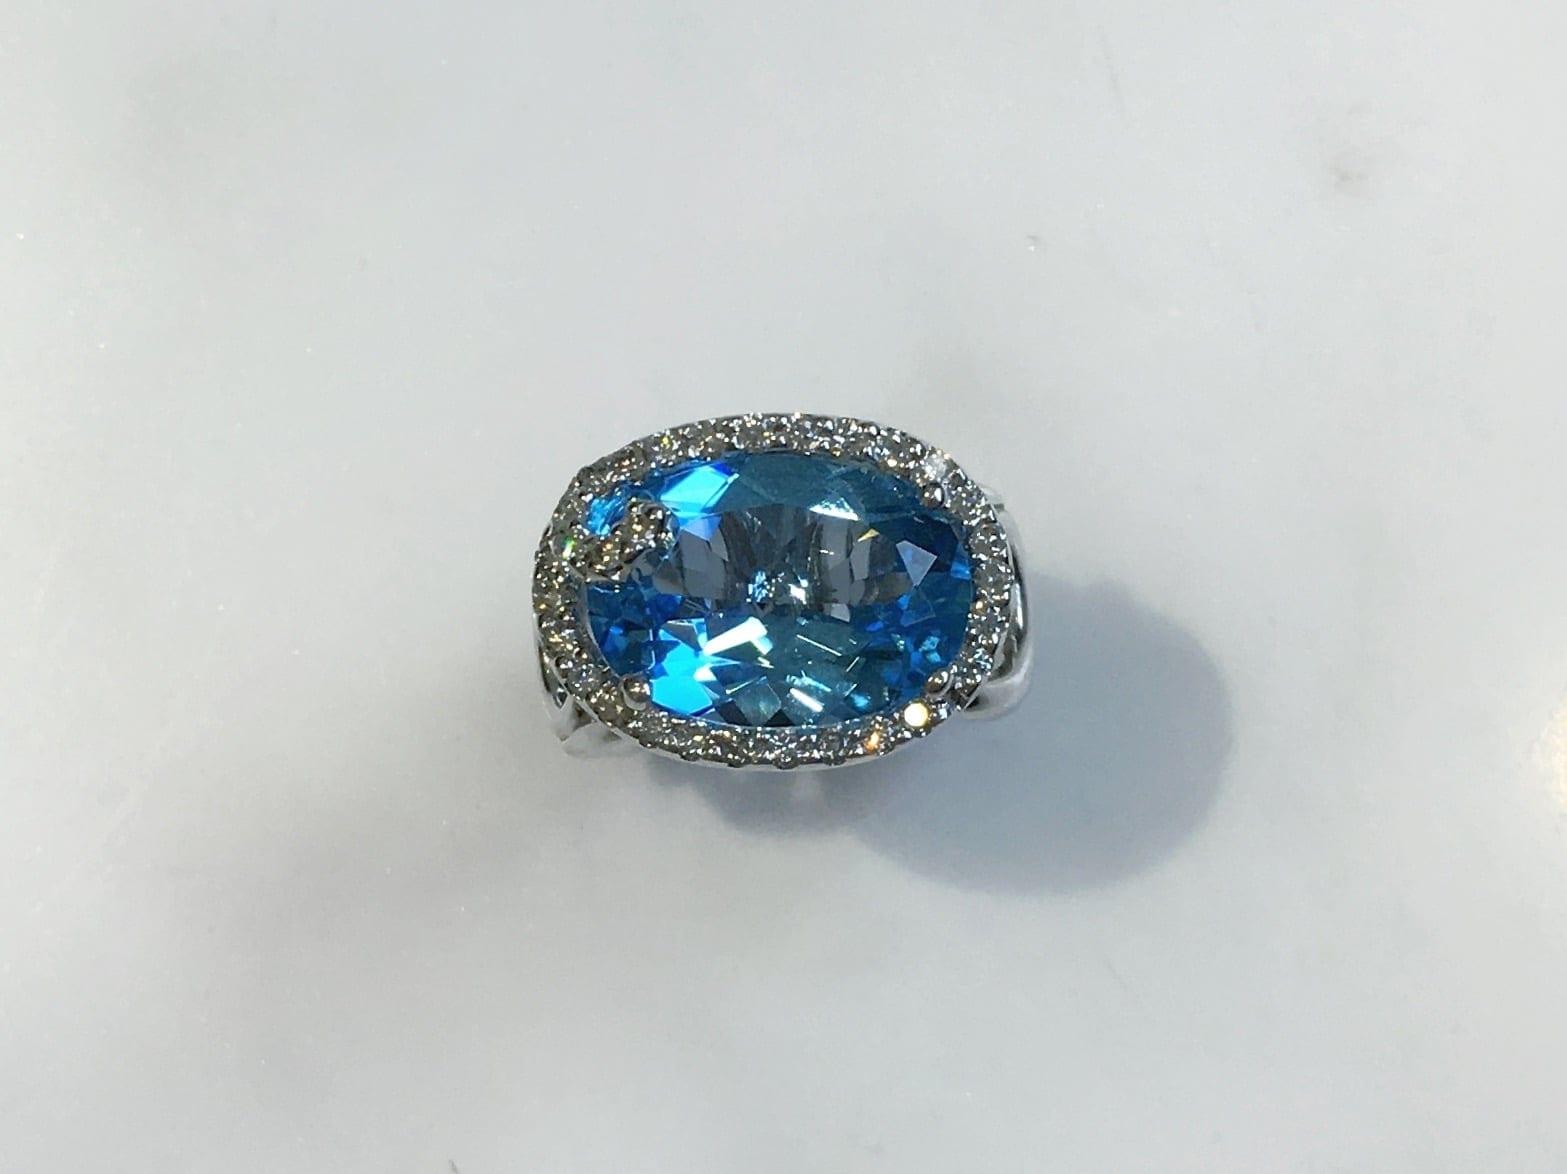 17080-gabriel-14kt-white-gold-blue-topaz-6.90ct-&-diamond-.37ctw-1